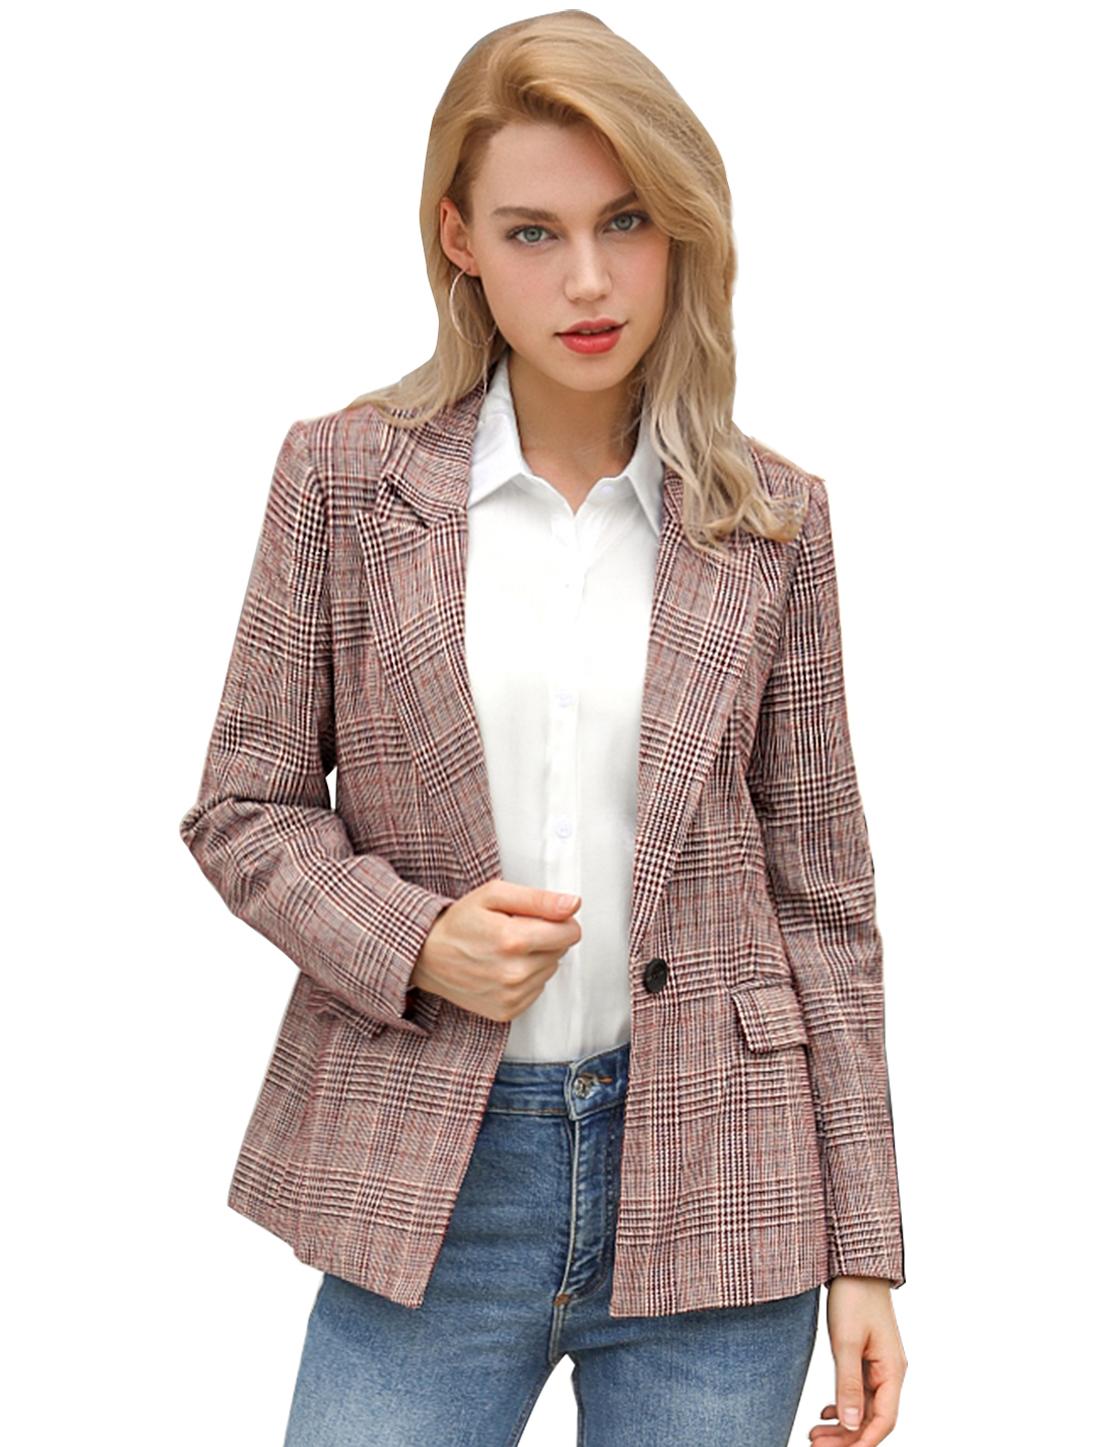 Women's Plaid Notched Lapel One Button Houndstooth Blazer Jacket Burgendy M